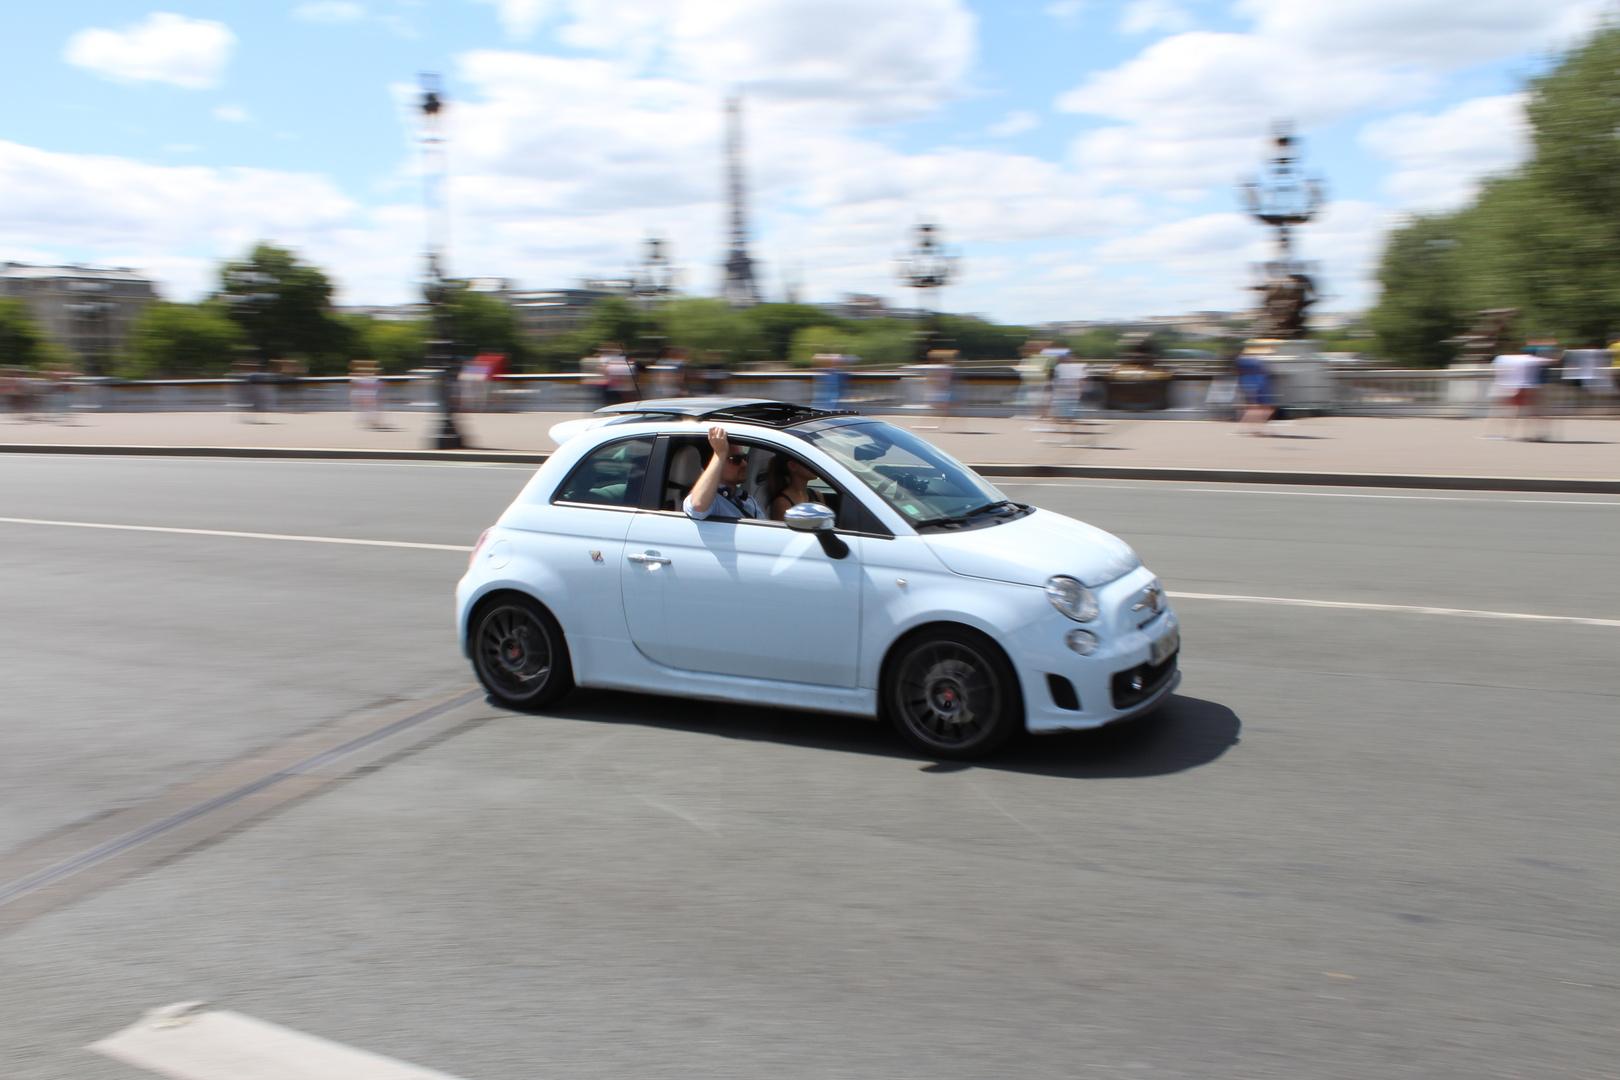 Ein italiener in Paris